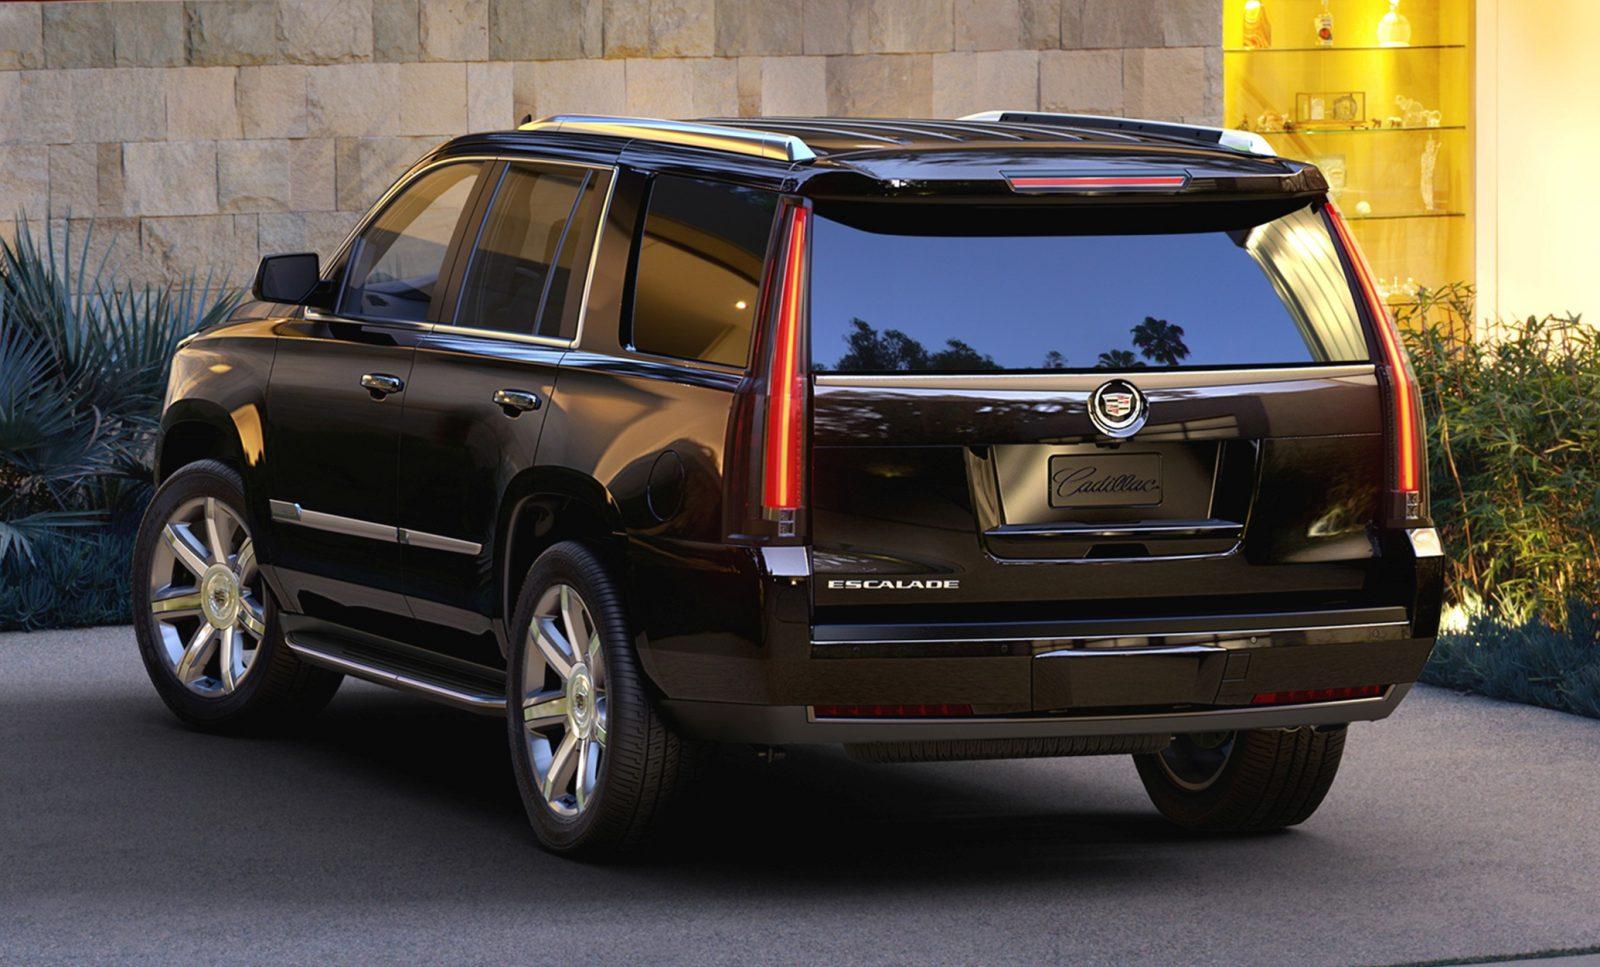 2015 Cadillac Escalade In-Depth Review + Mega Galleries35